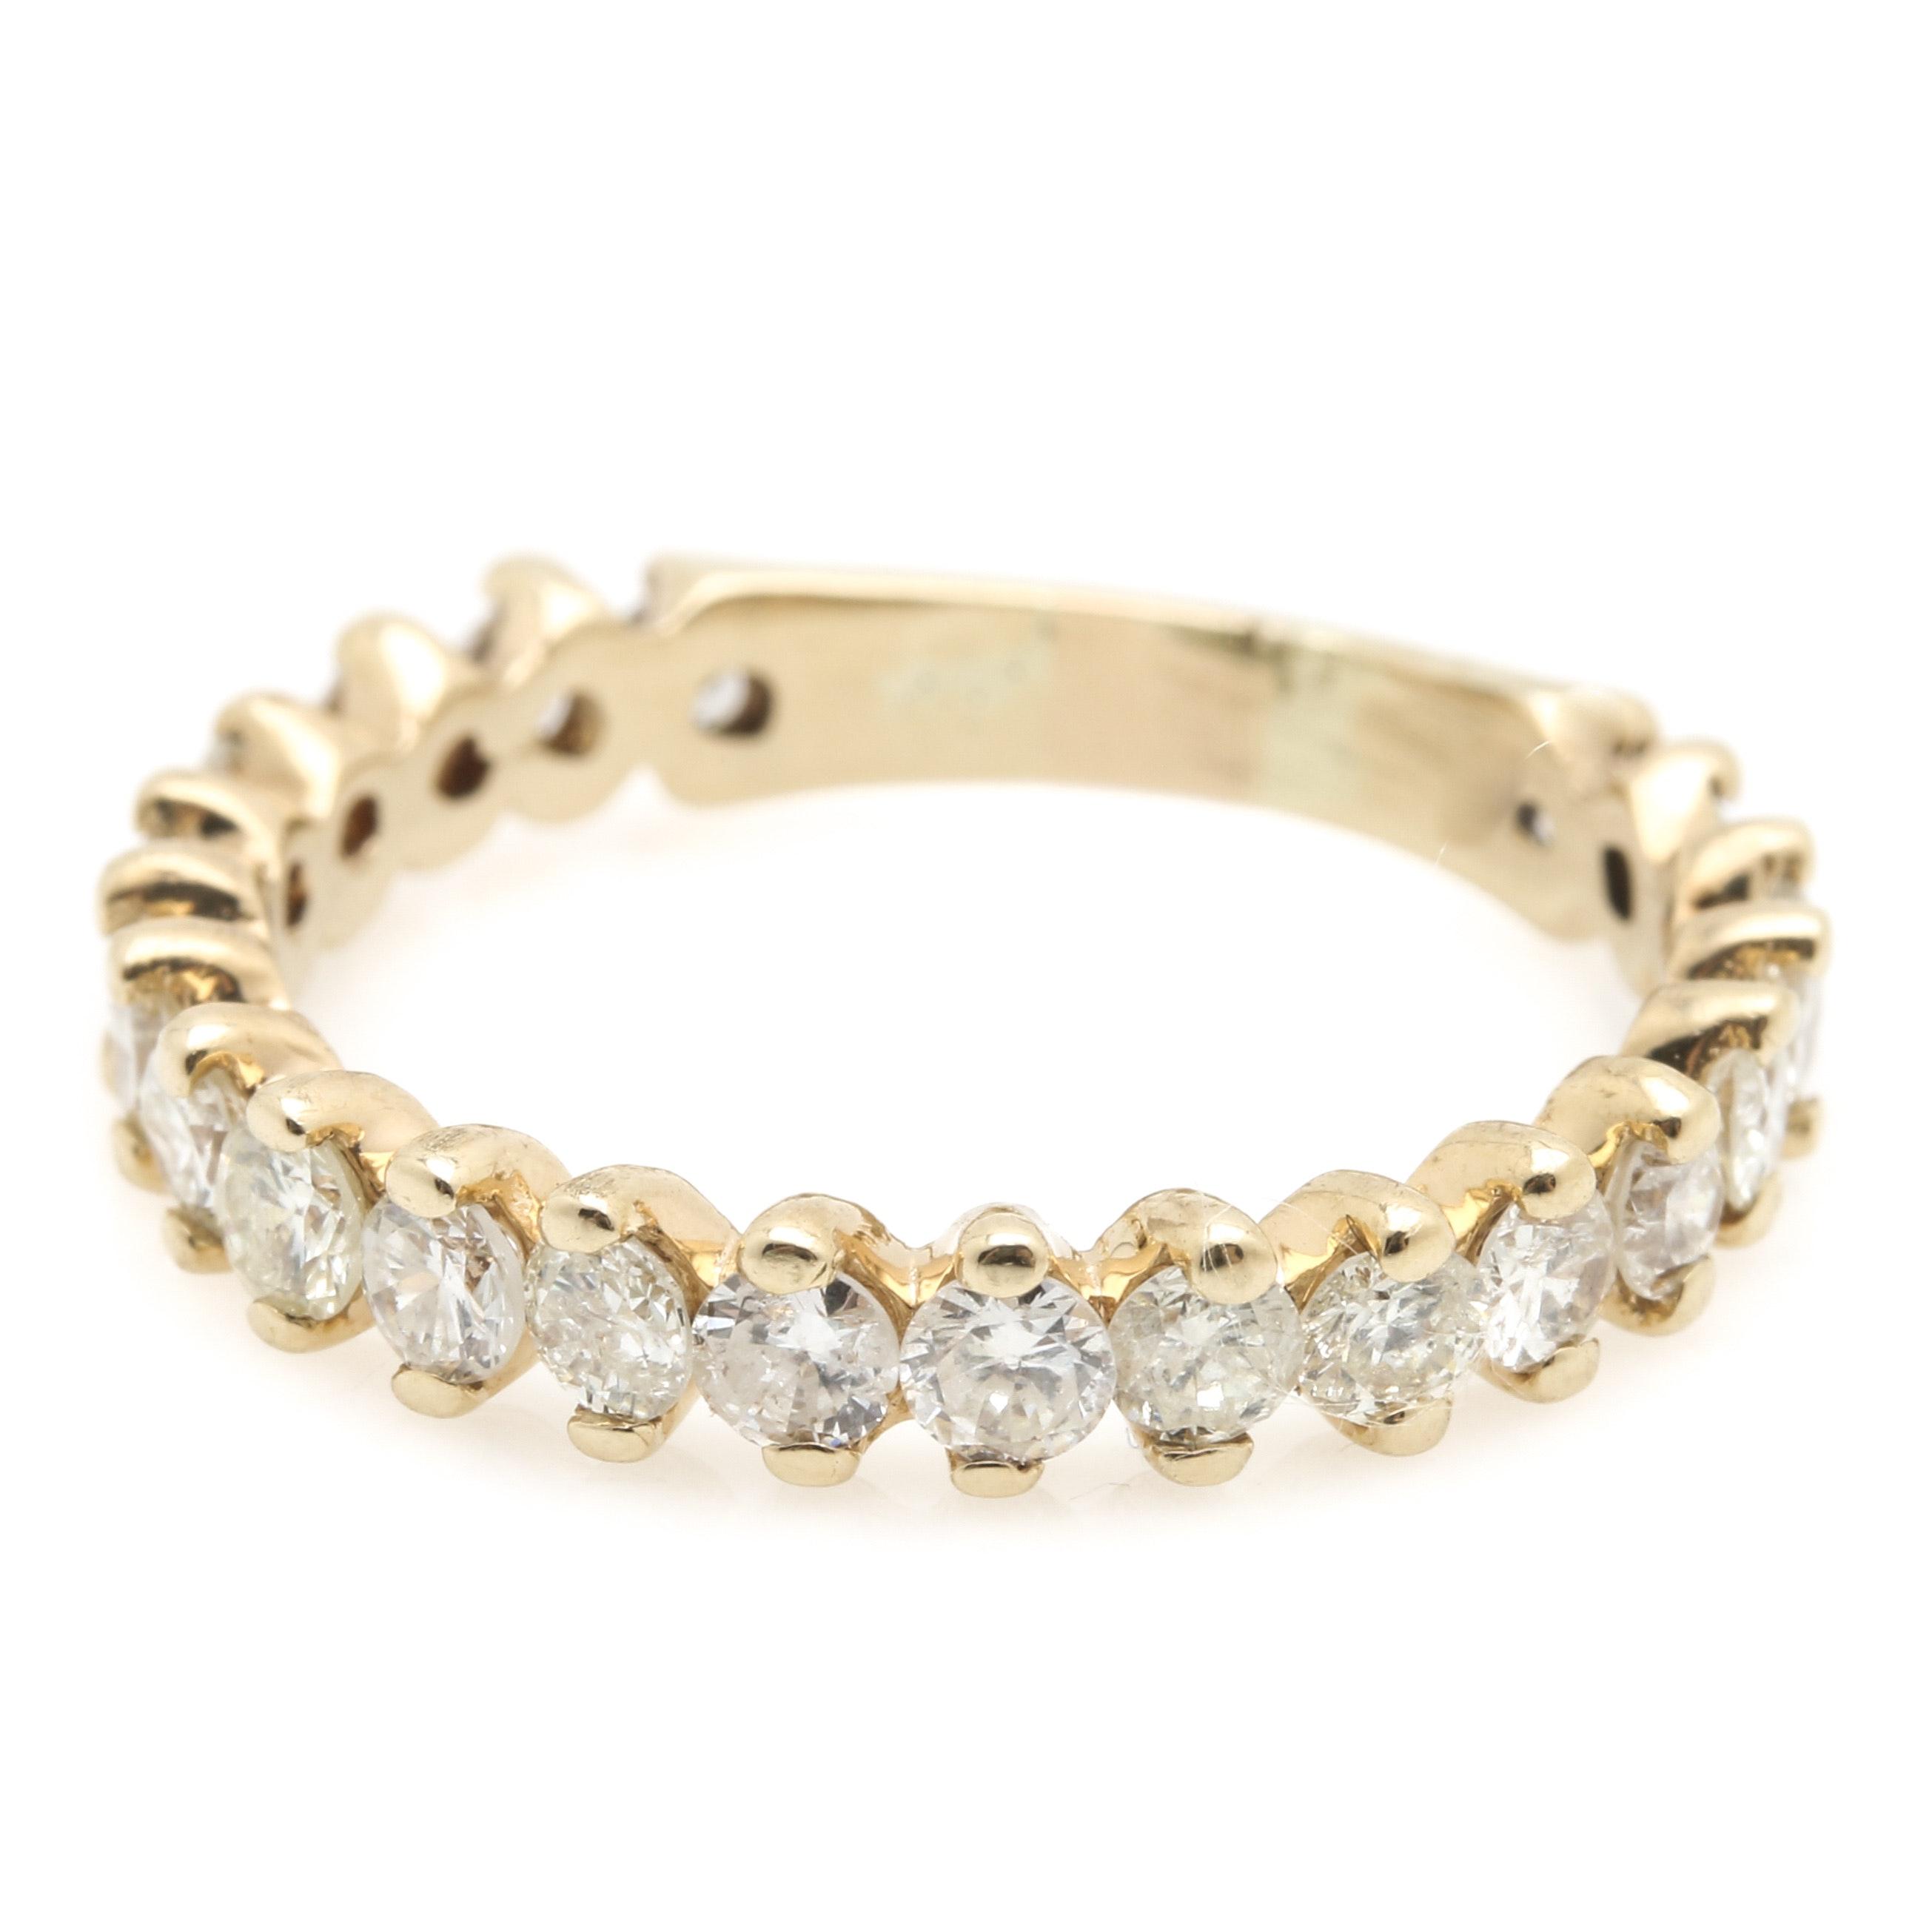 14K Yellow Gold 1.21 CTW Diamond Ring